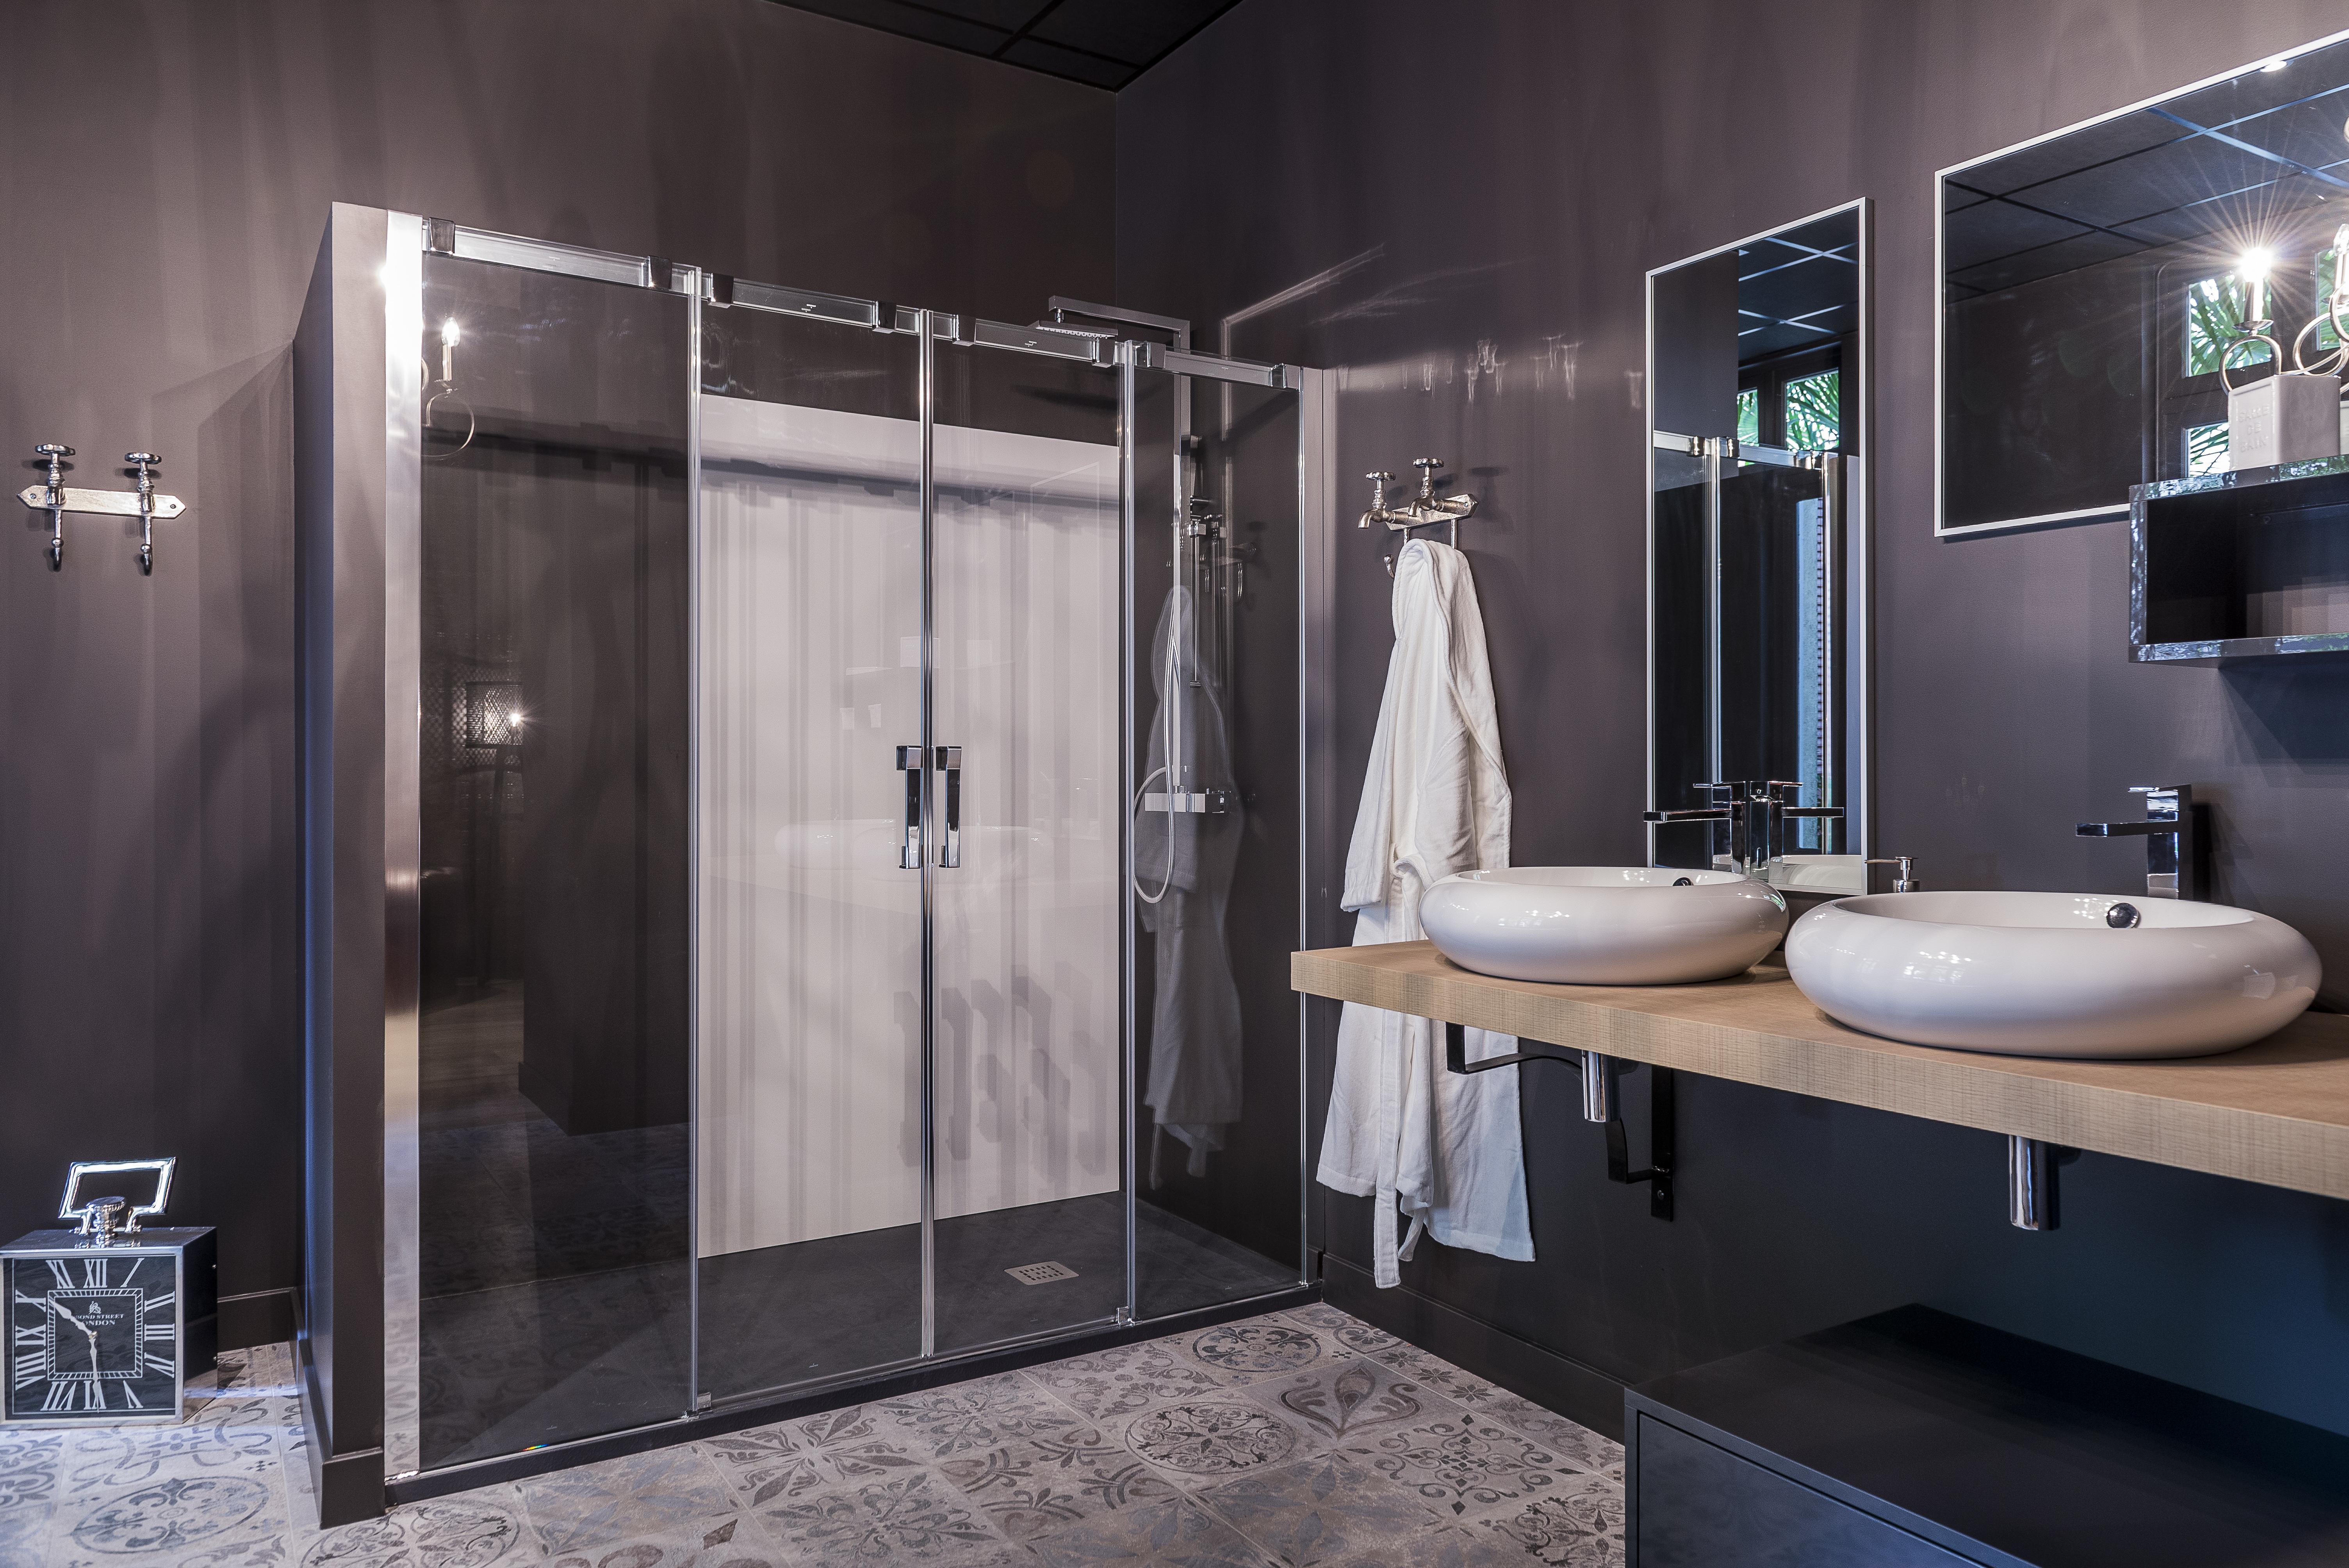 Salle De Bain Showroom ~ r novation du showroom idkrea idkrea rennes